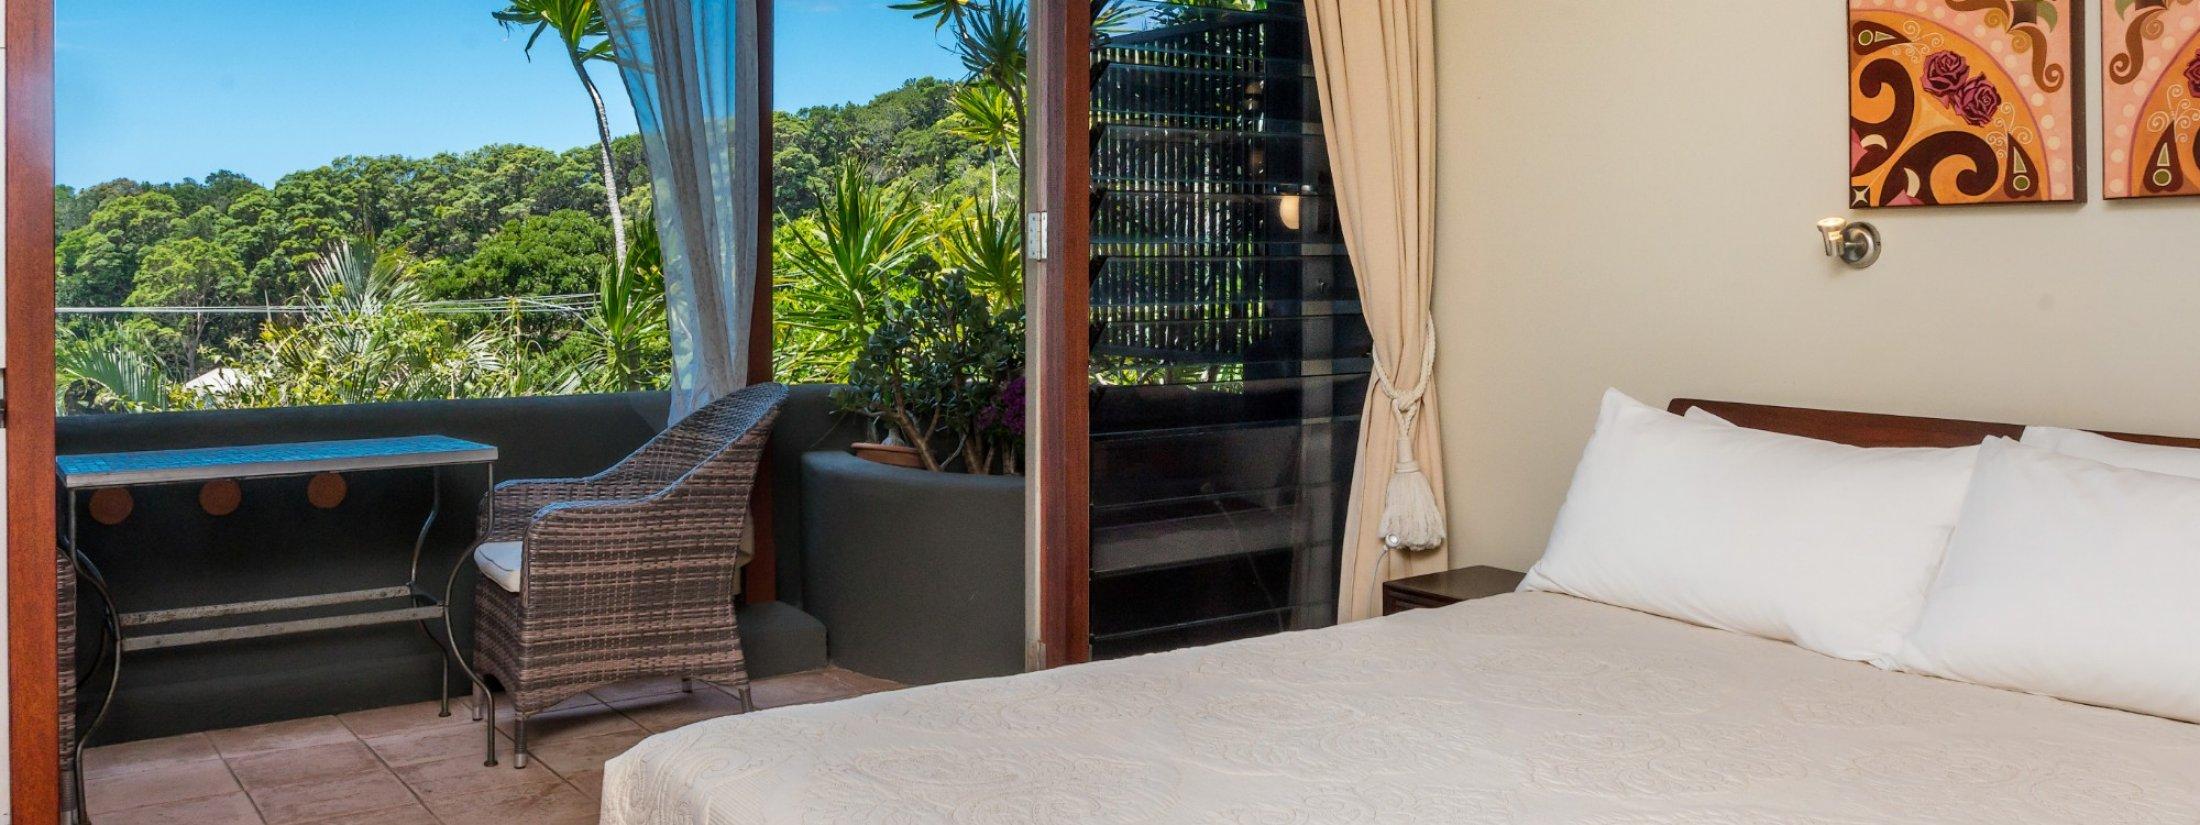 Wategos Retreats - Wategos Beach - Byron Bay - Studio bed and bush views